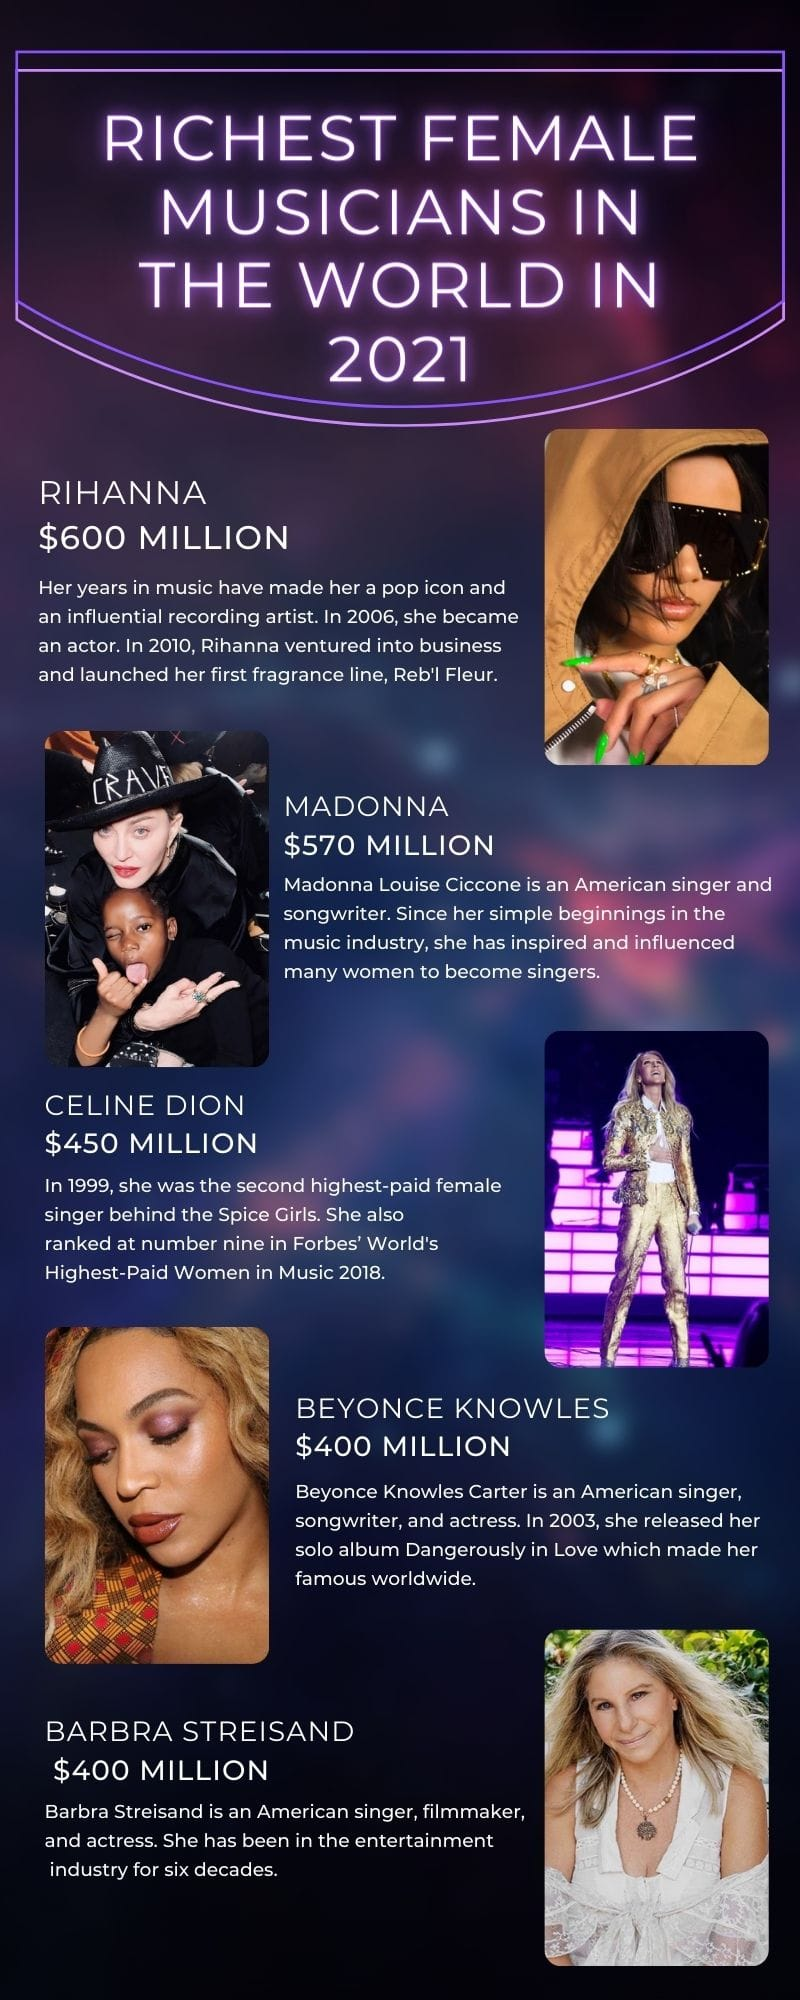 Richest female musicians in the world